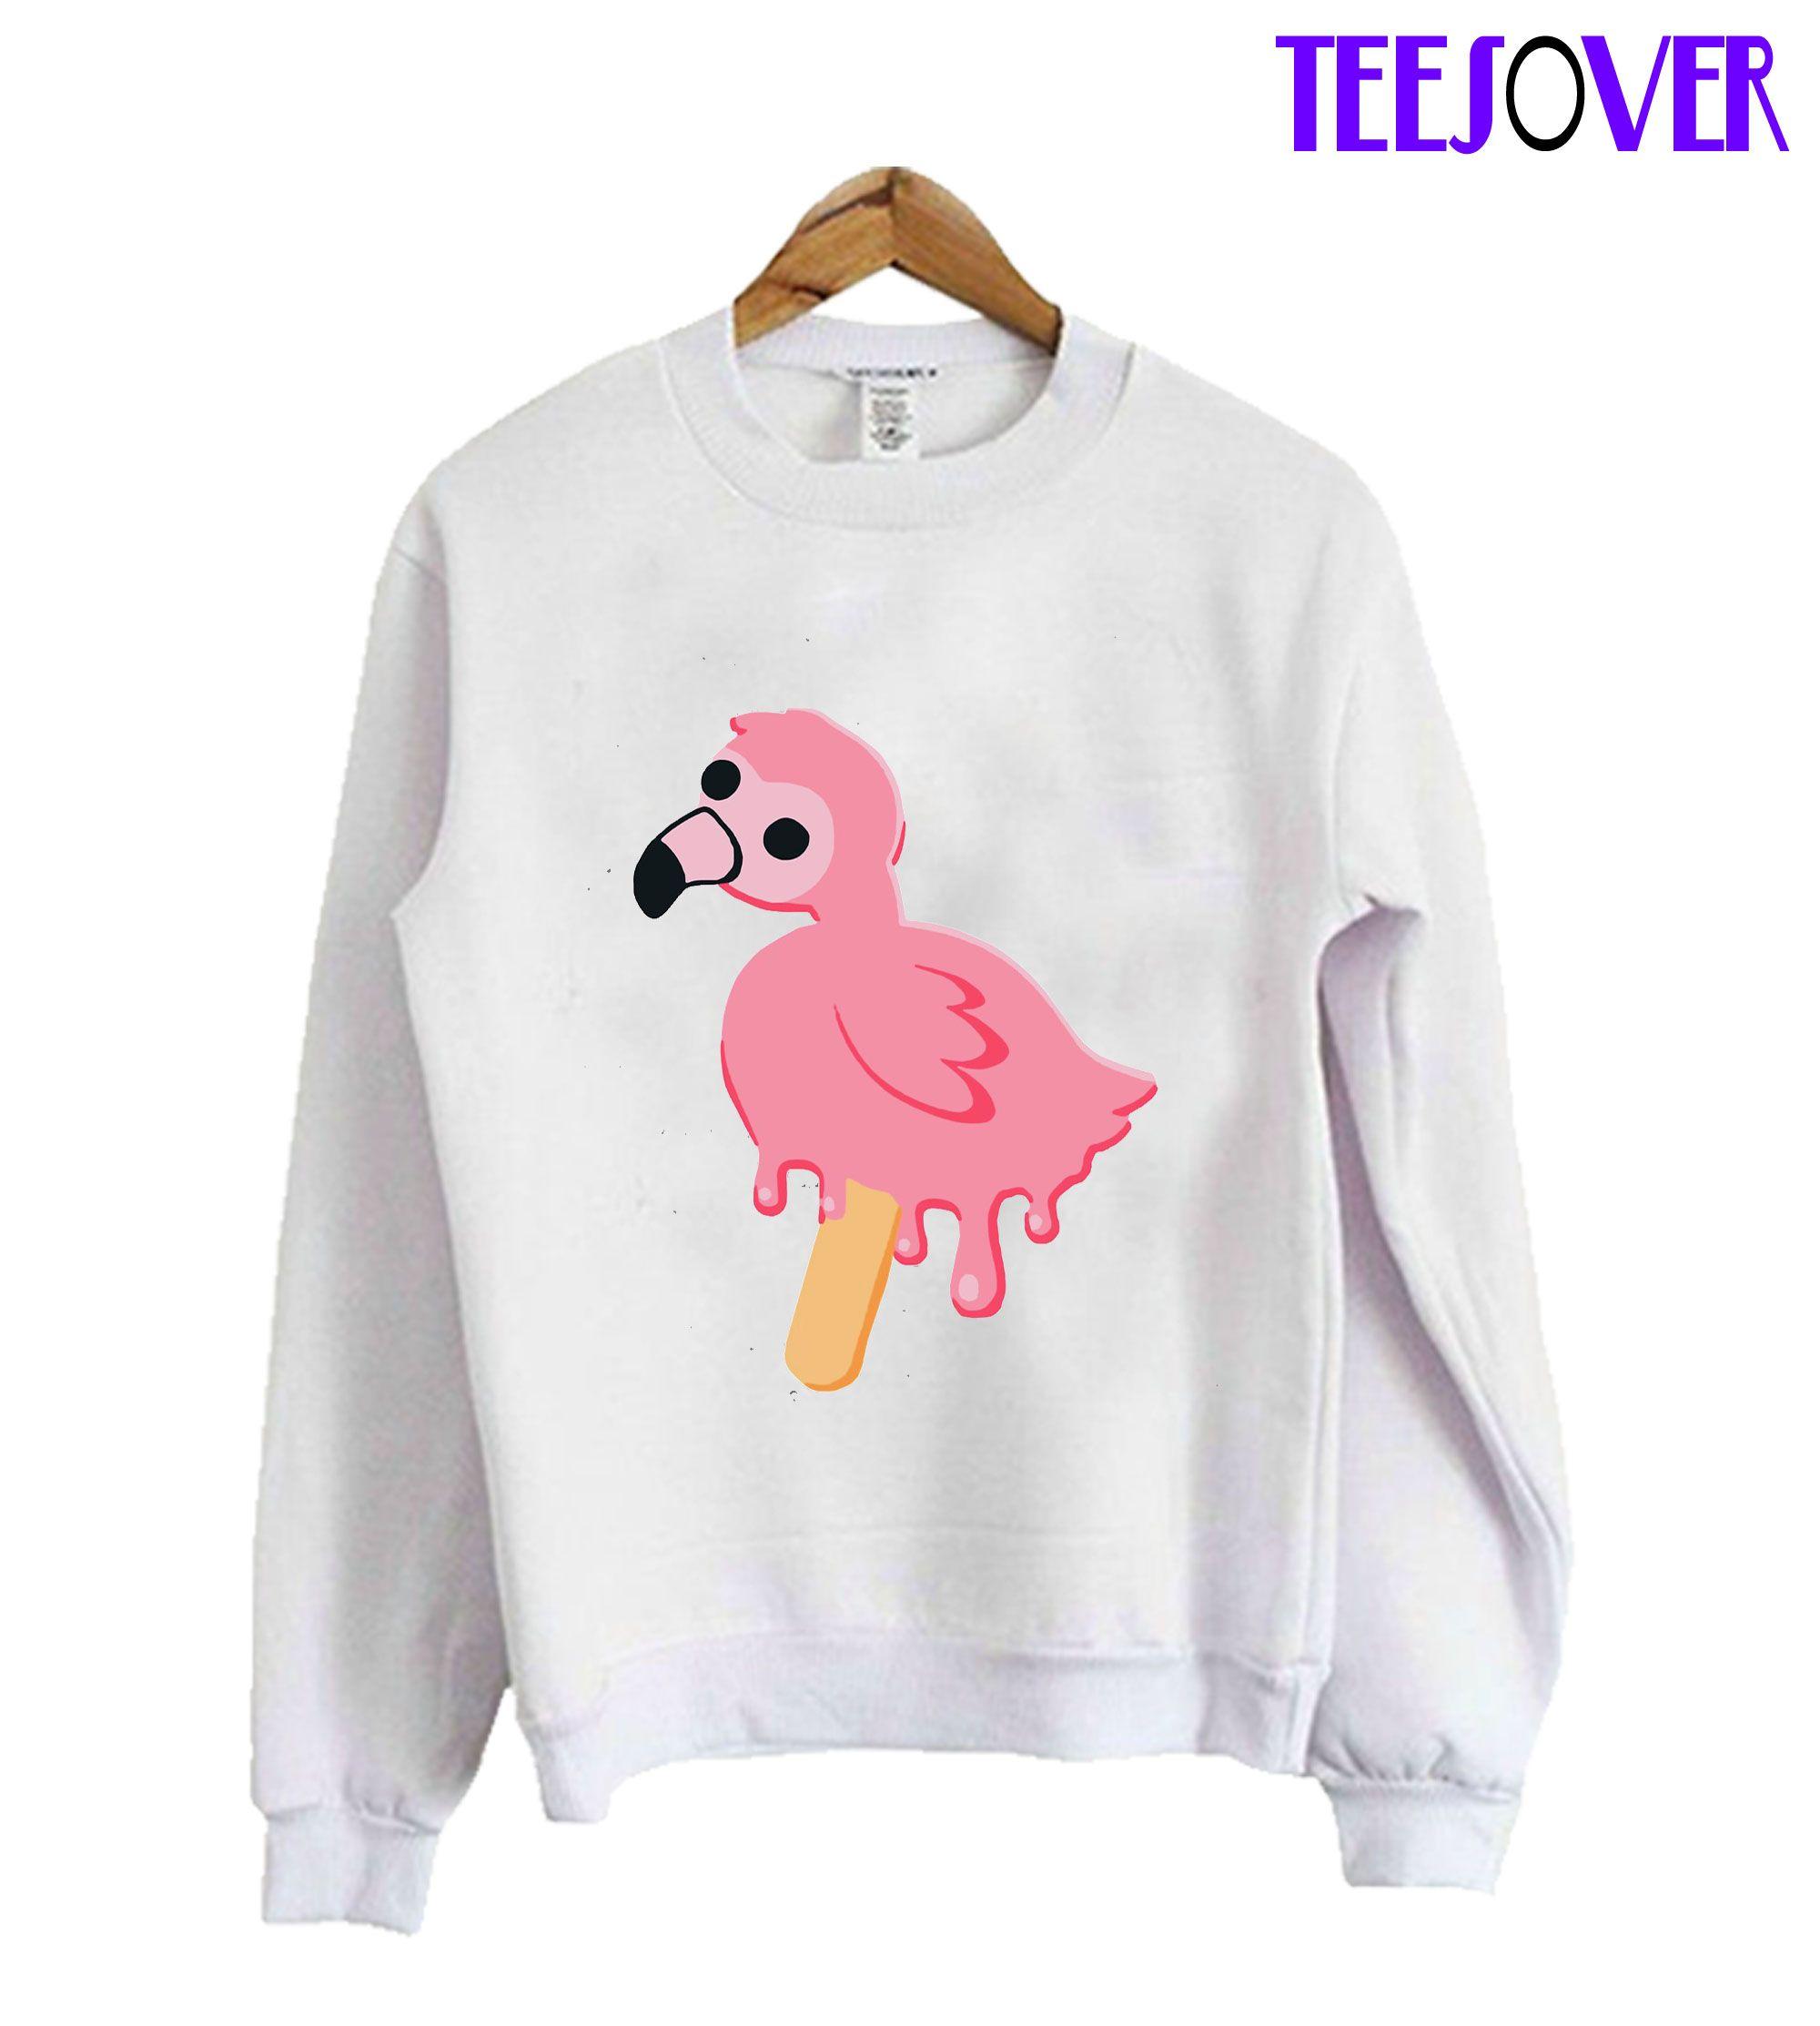 Albert Flamingo Melting Pop Mrflimflam Sweatshirt Sweatshirts Sweatshirt Fashion Print Clothes [ 2226 x 2000 Pixel ]